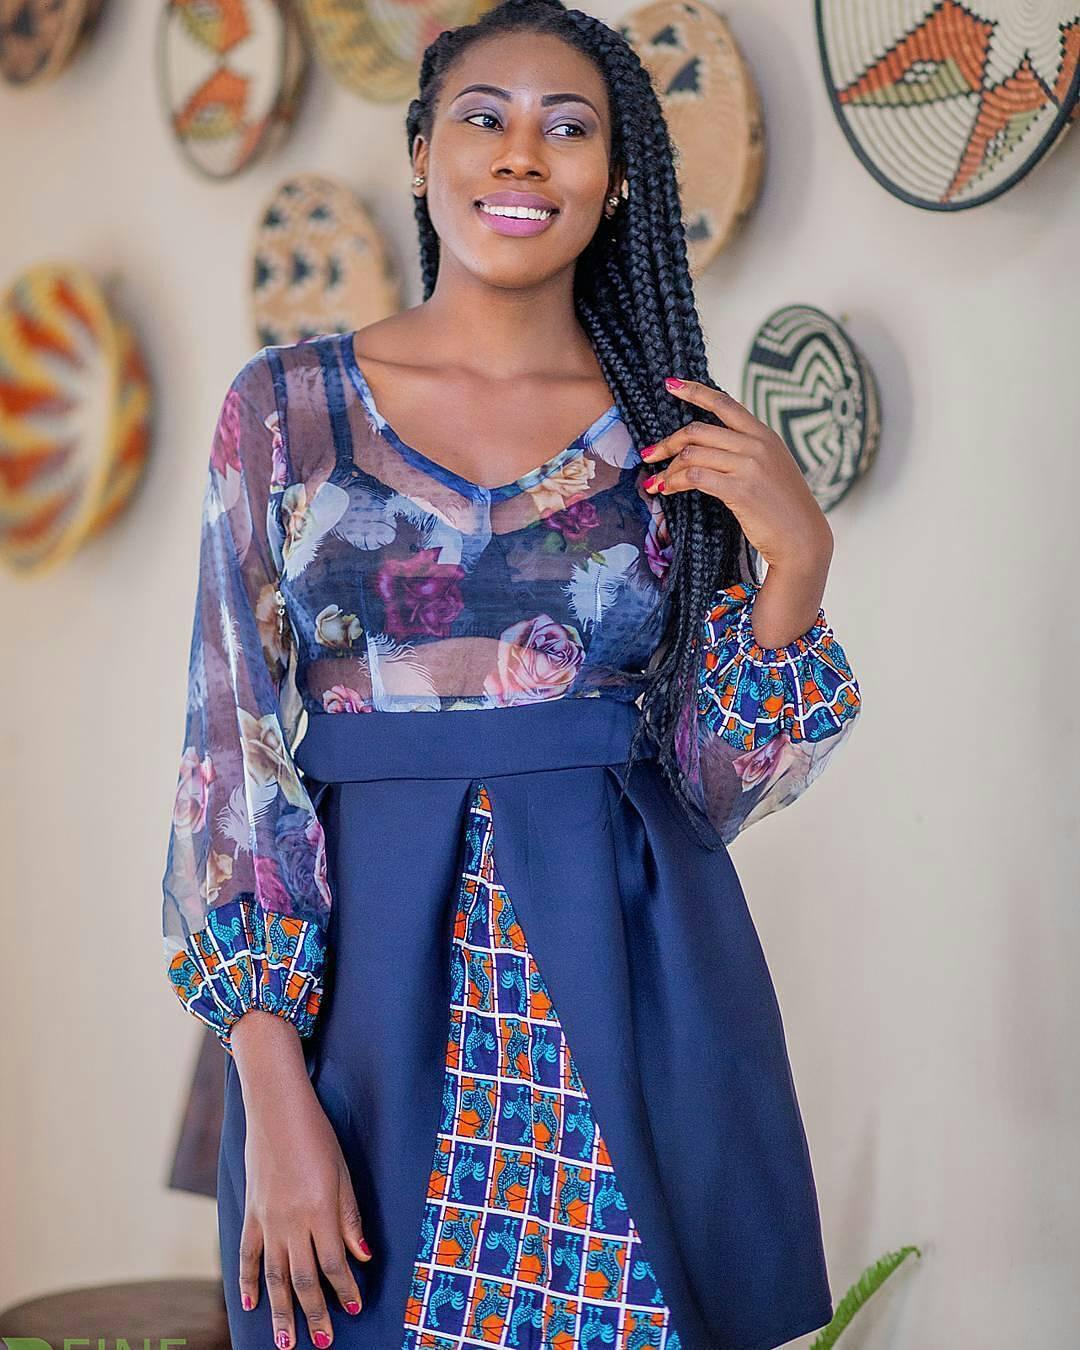 #Cameroon #FashionDesigner #AfricanPrintDresses #AfricanPrintStyle #MargoMode